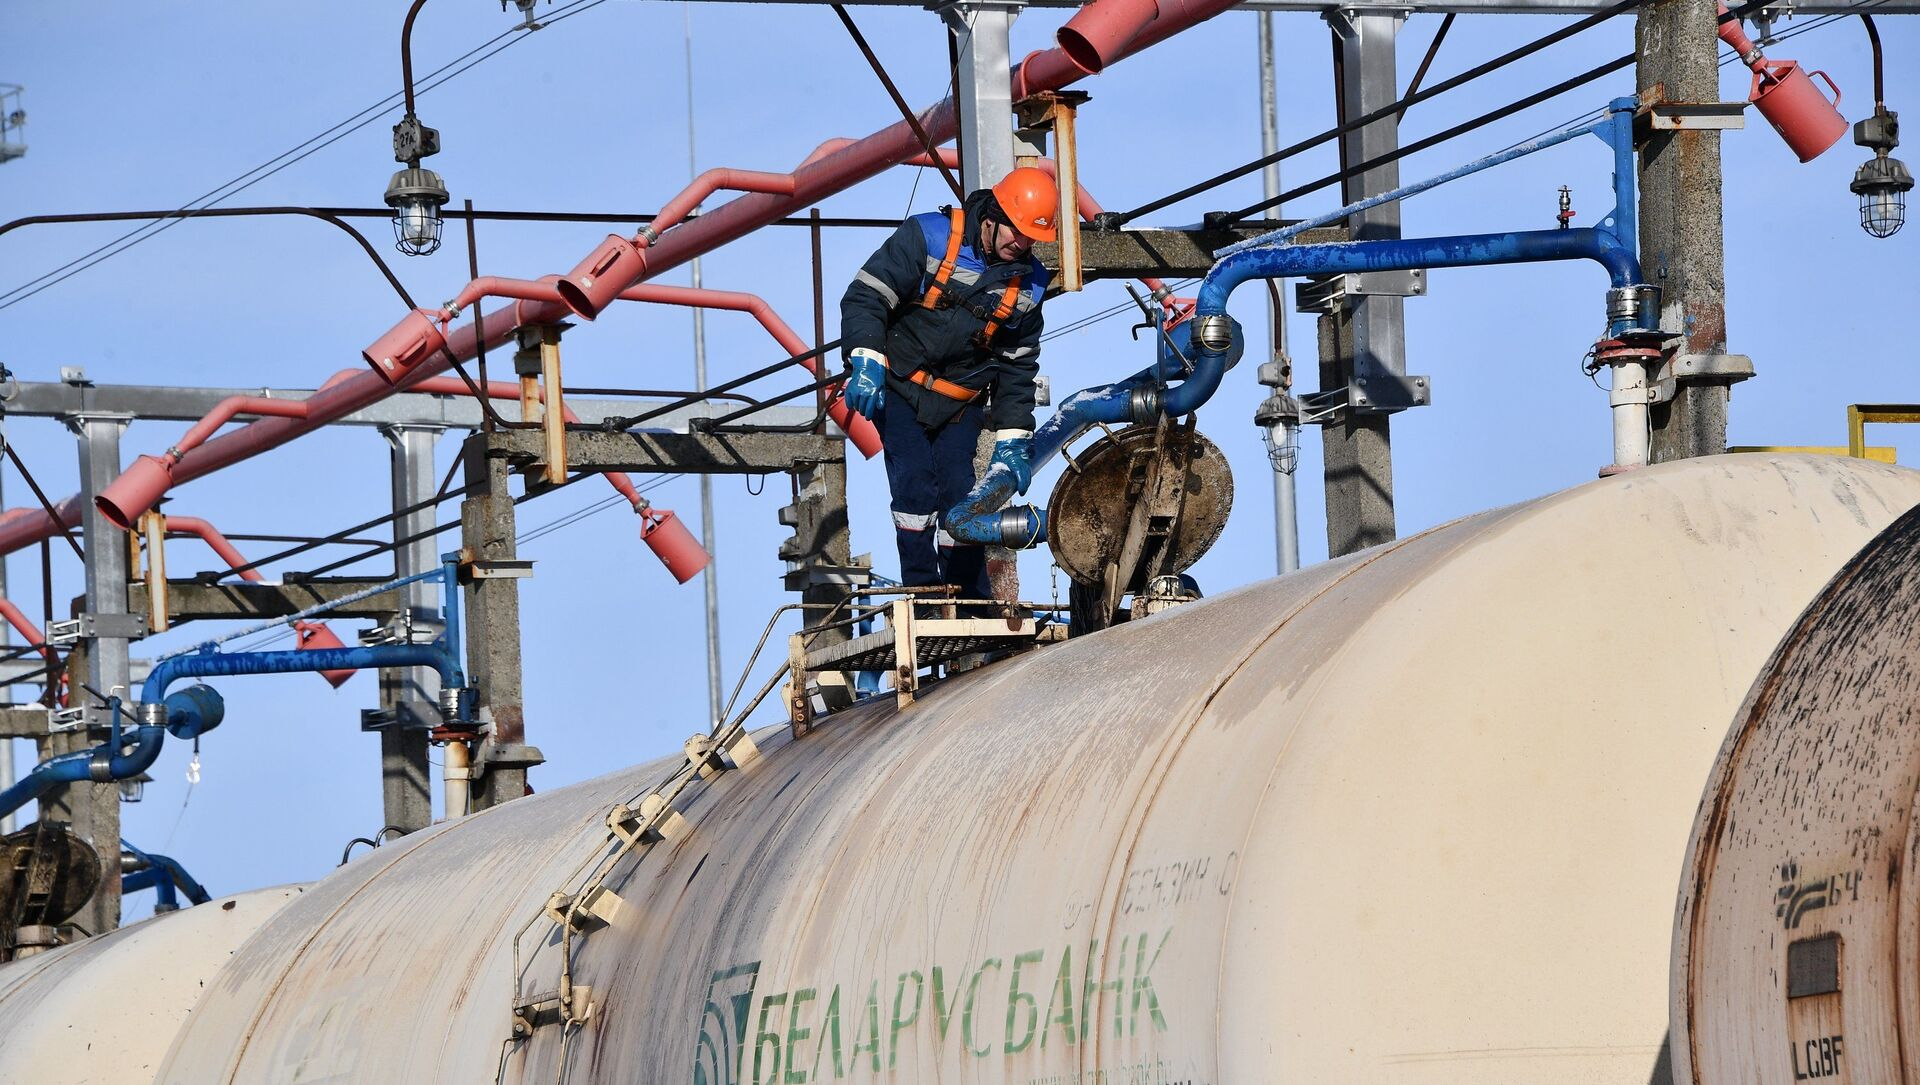 Транспортировка нефти Запад - Транснефтепродукт - Sputnik Беларусь, 1920, 01.03.2021